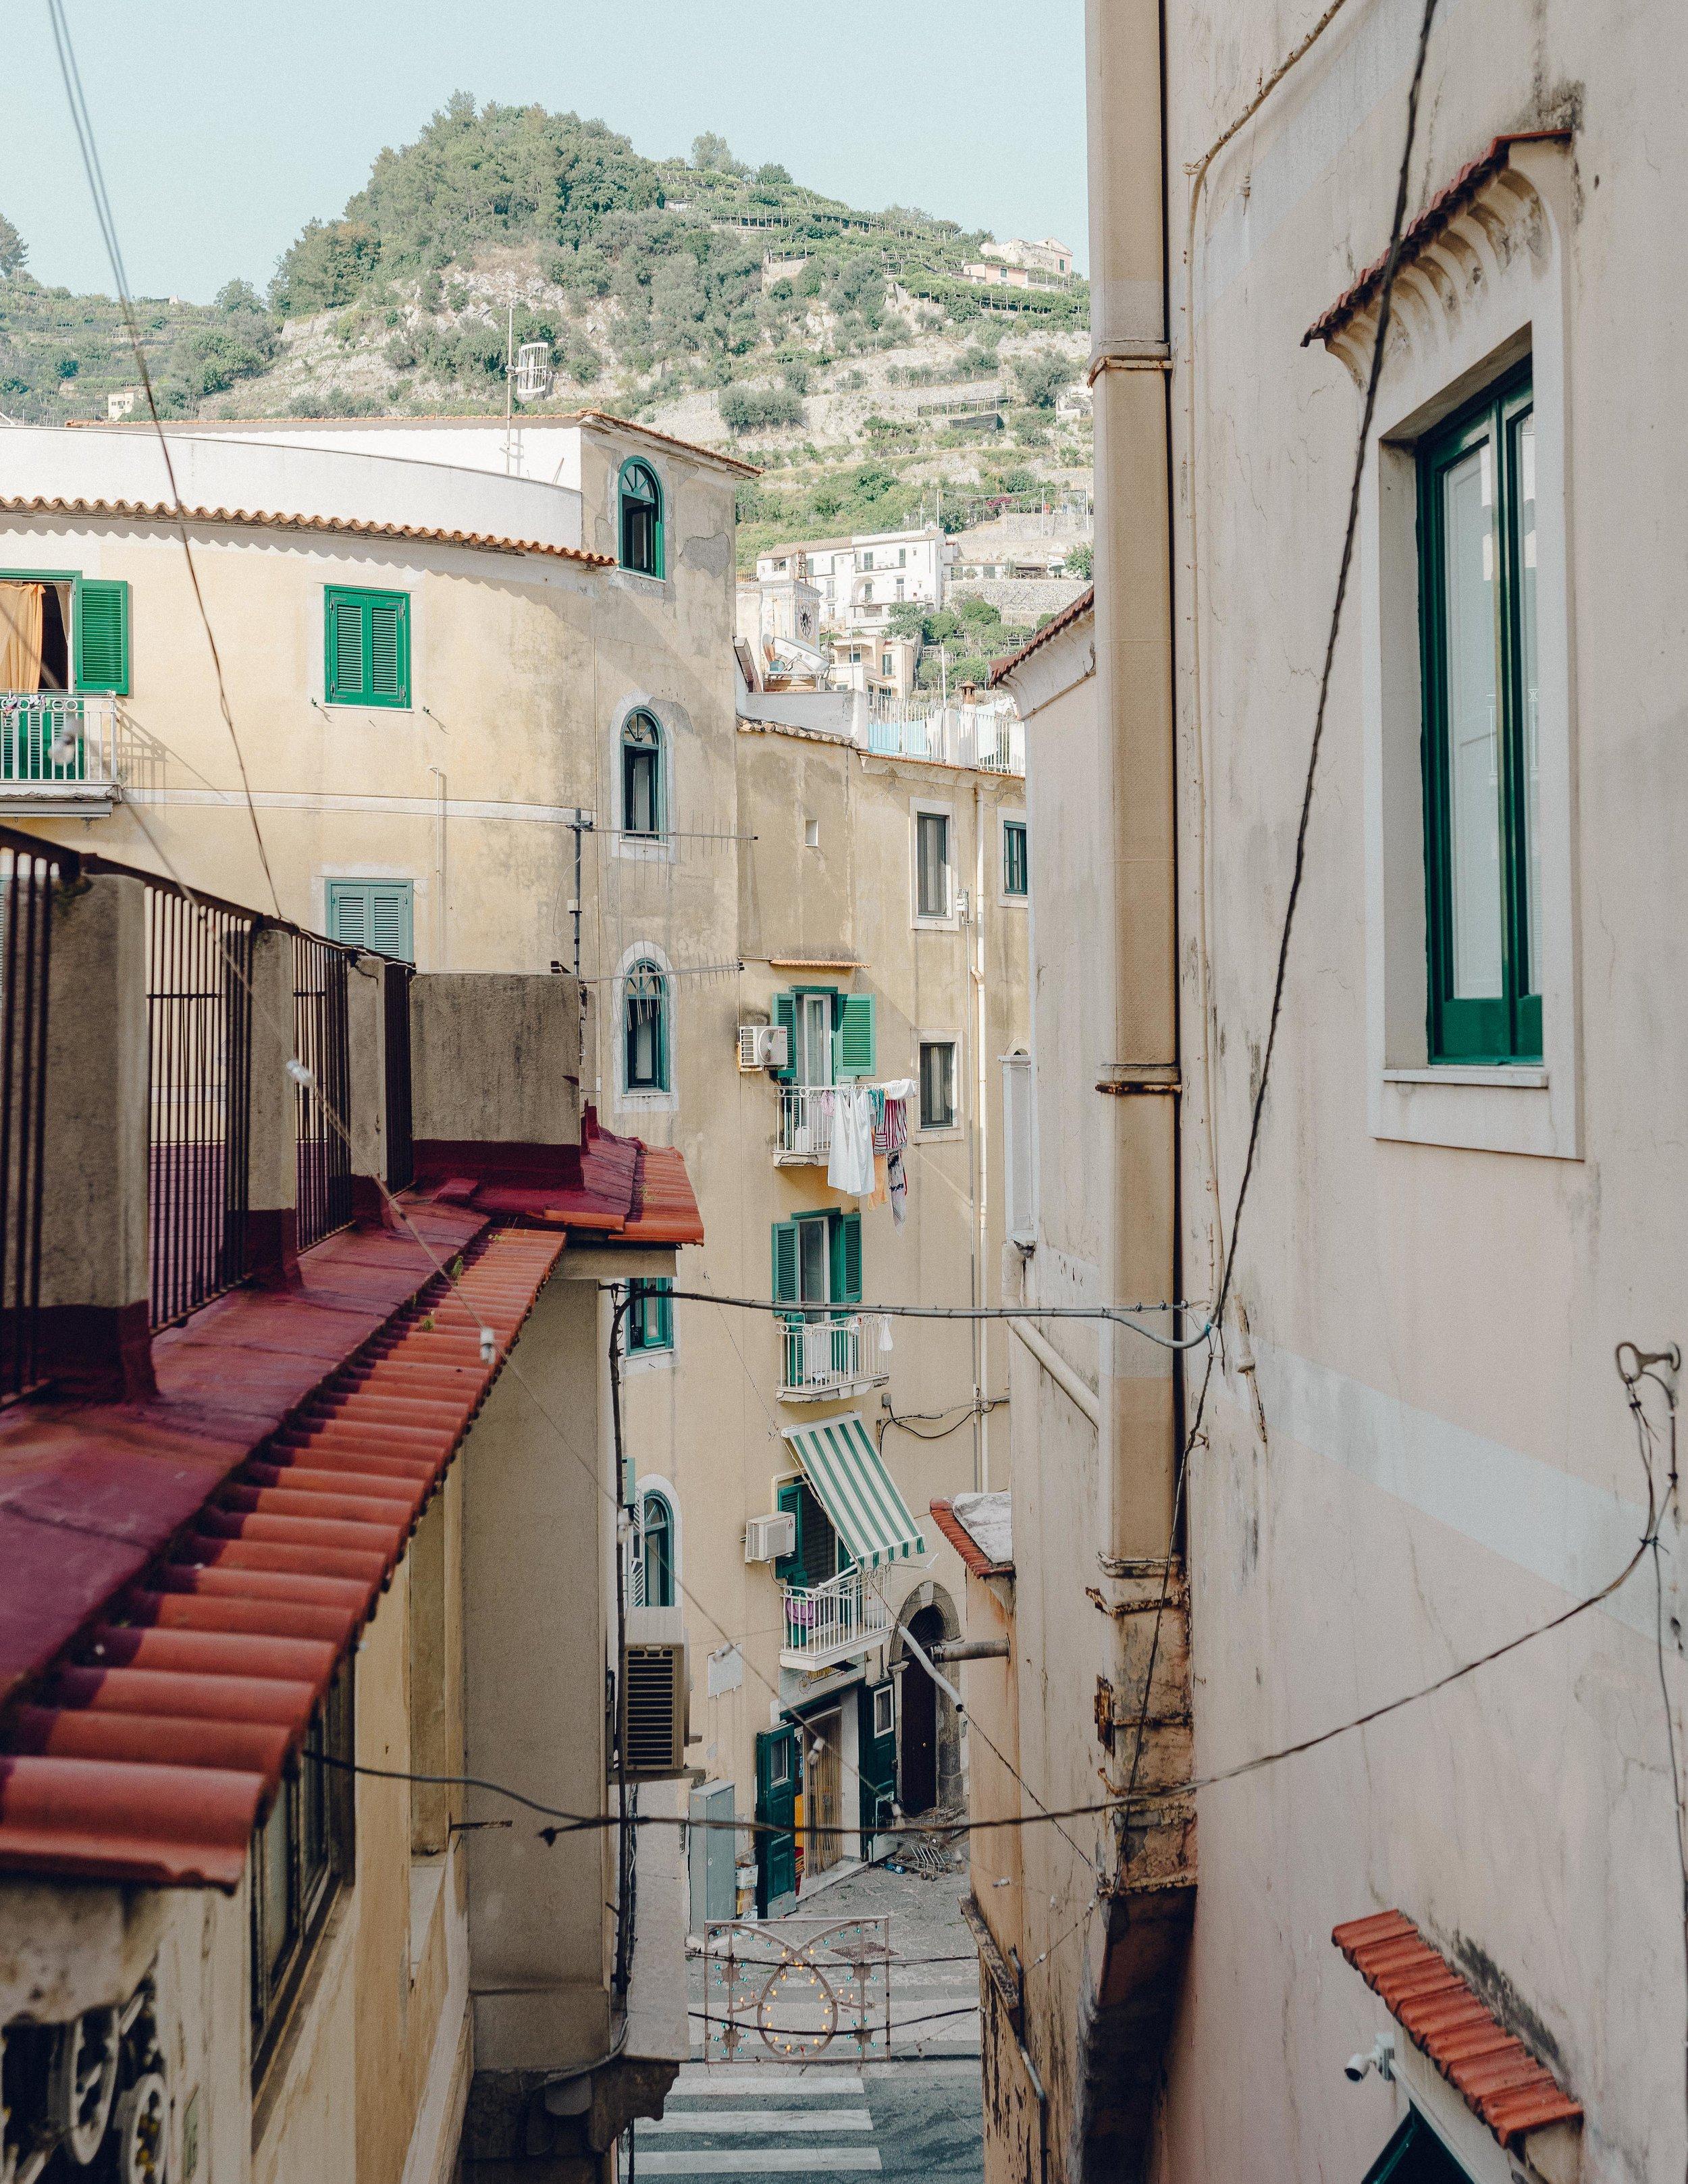 ASROSENVINGE_Roadtrip_Italy_Puglia_Amalfi-07484.jpg